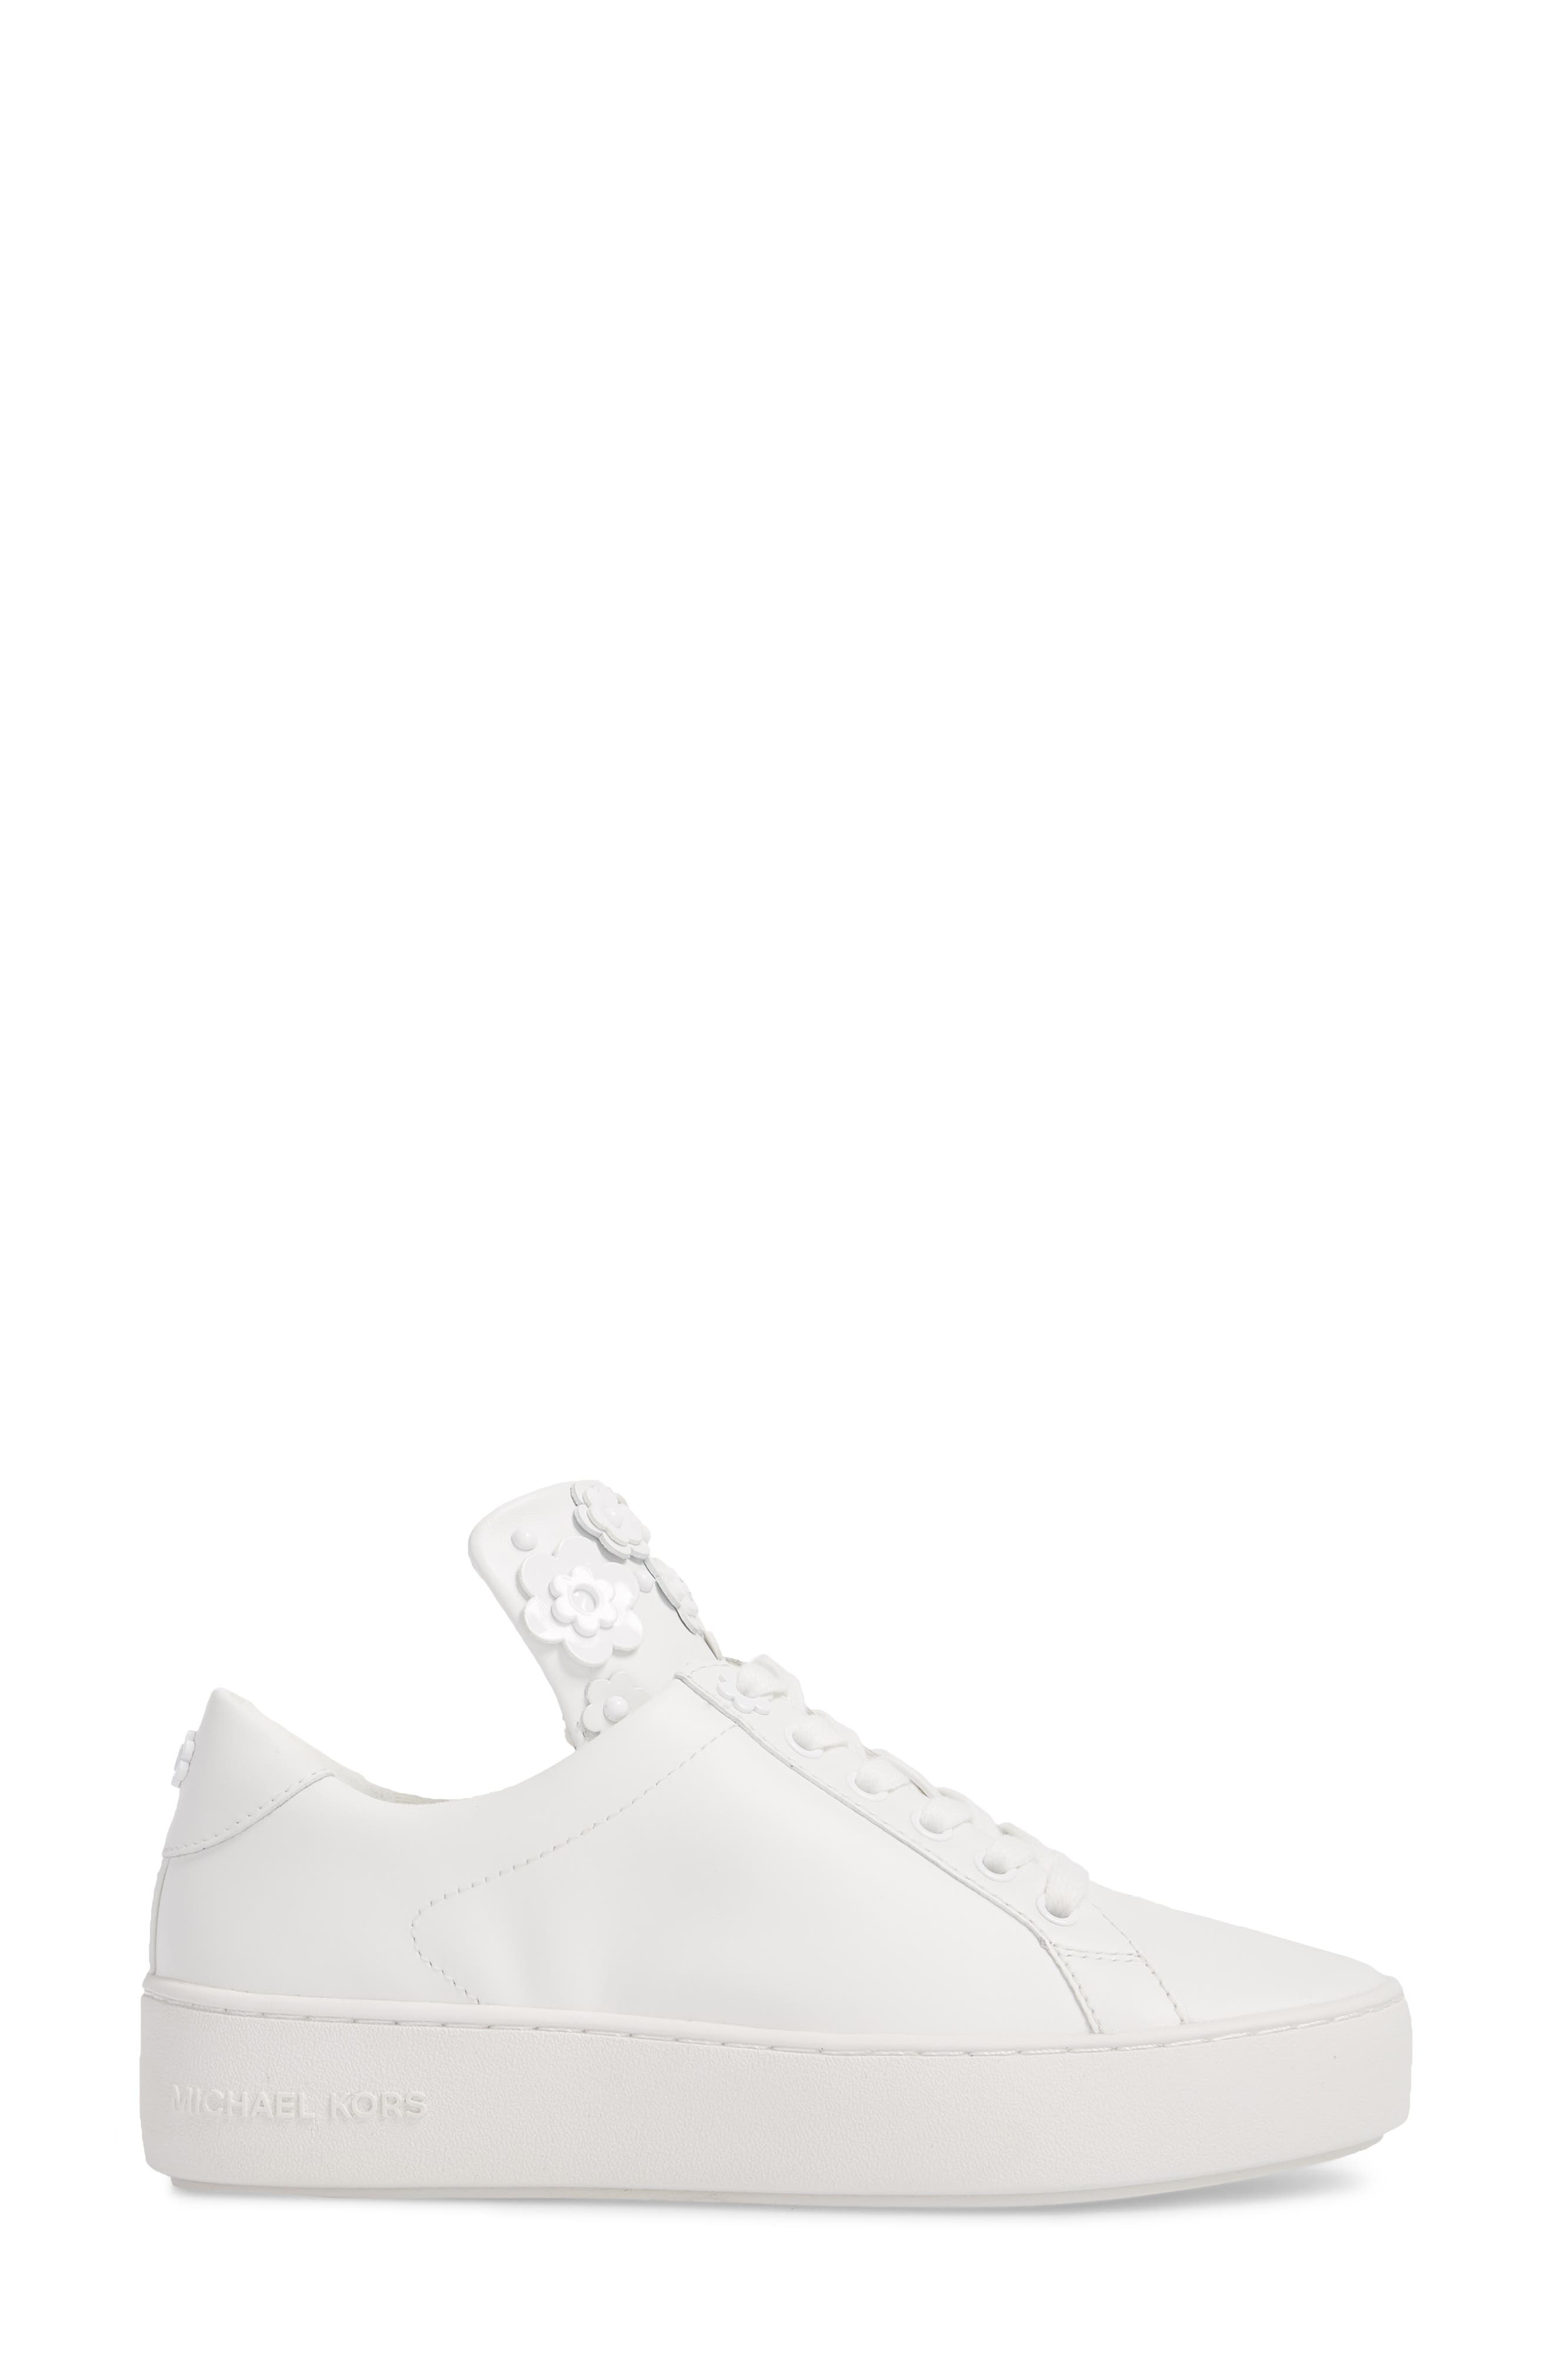 Mindy Platform Sneaker,                             Alternate thumbnail 3, color,                             Optic White